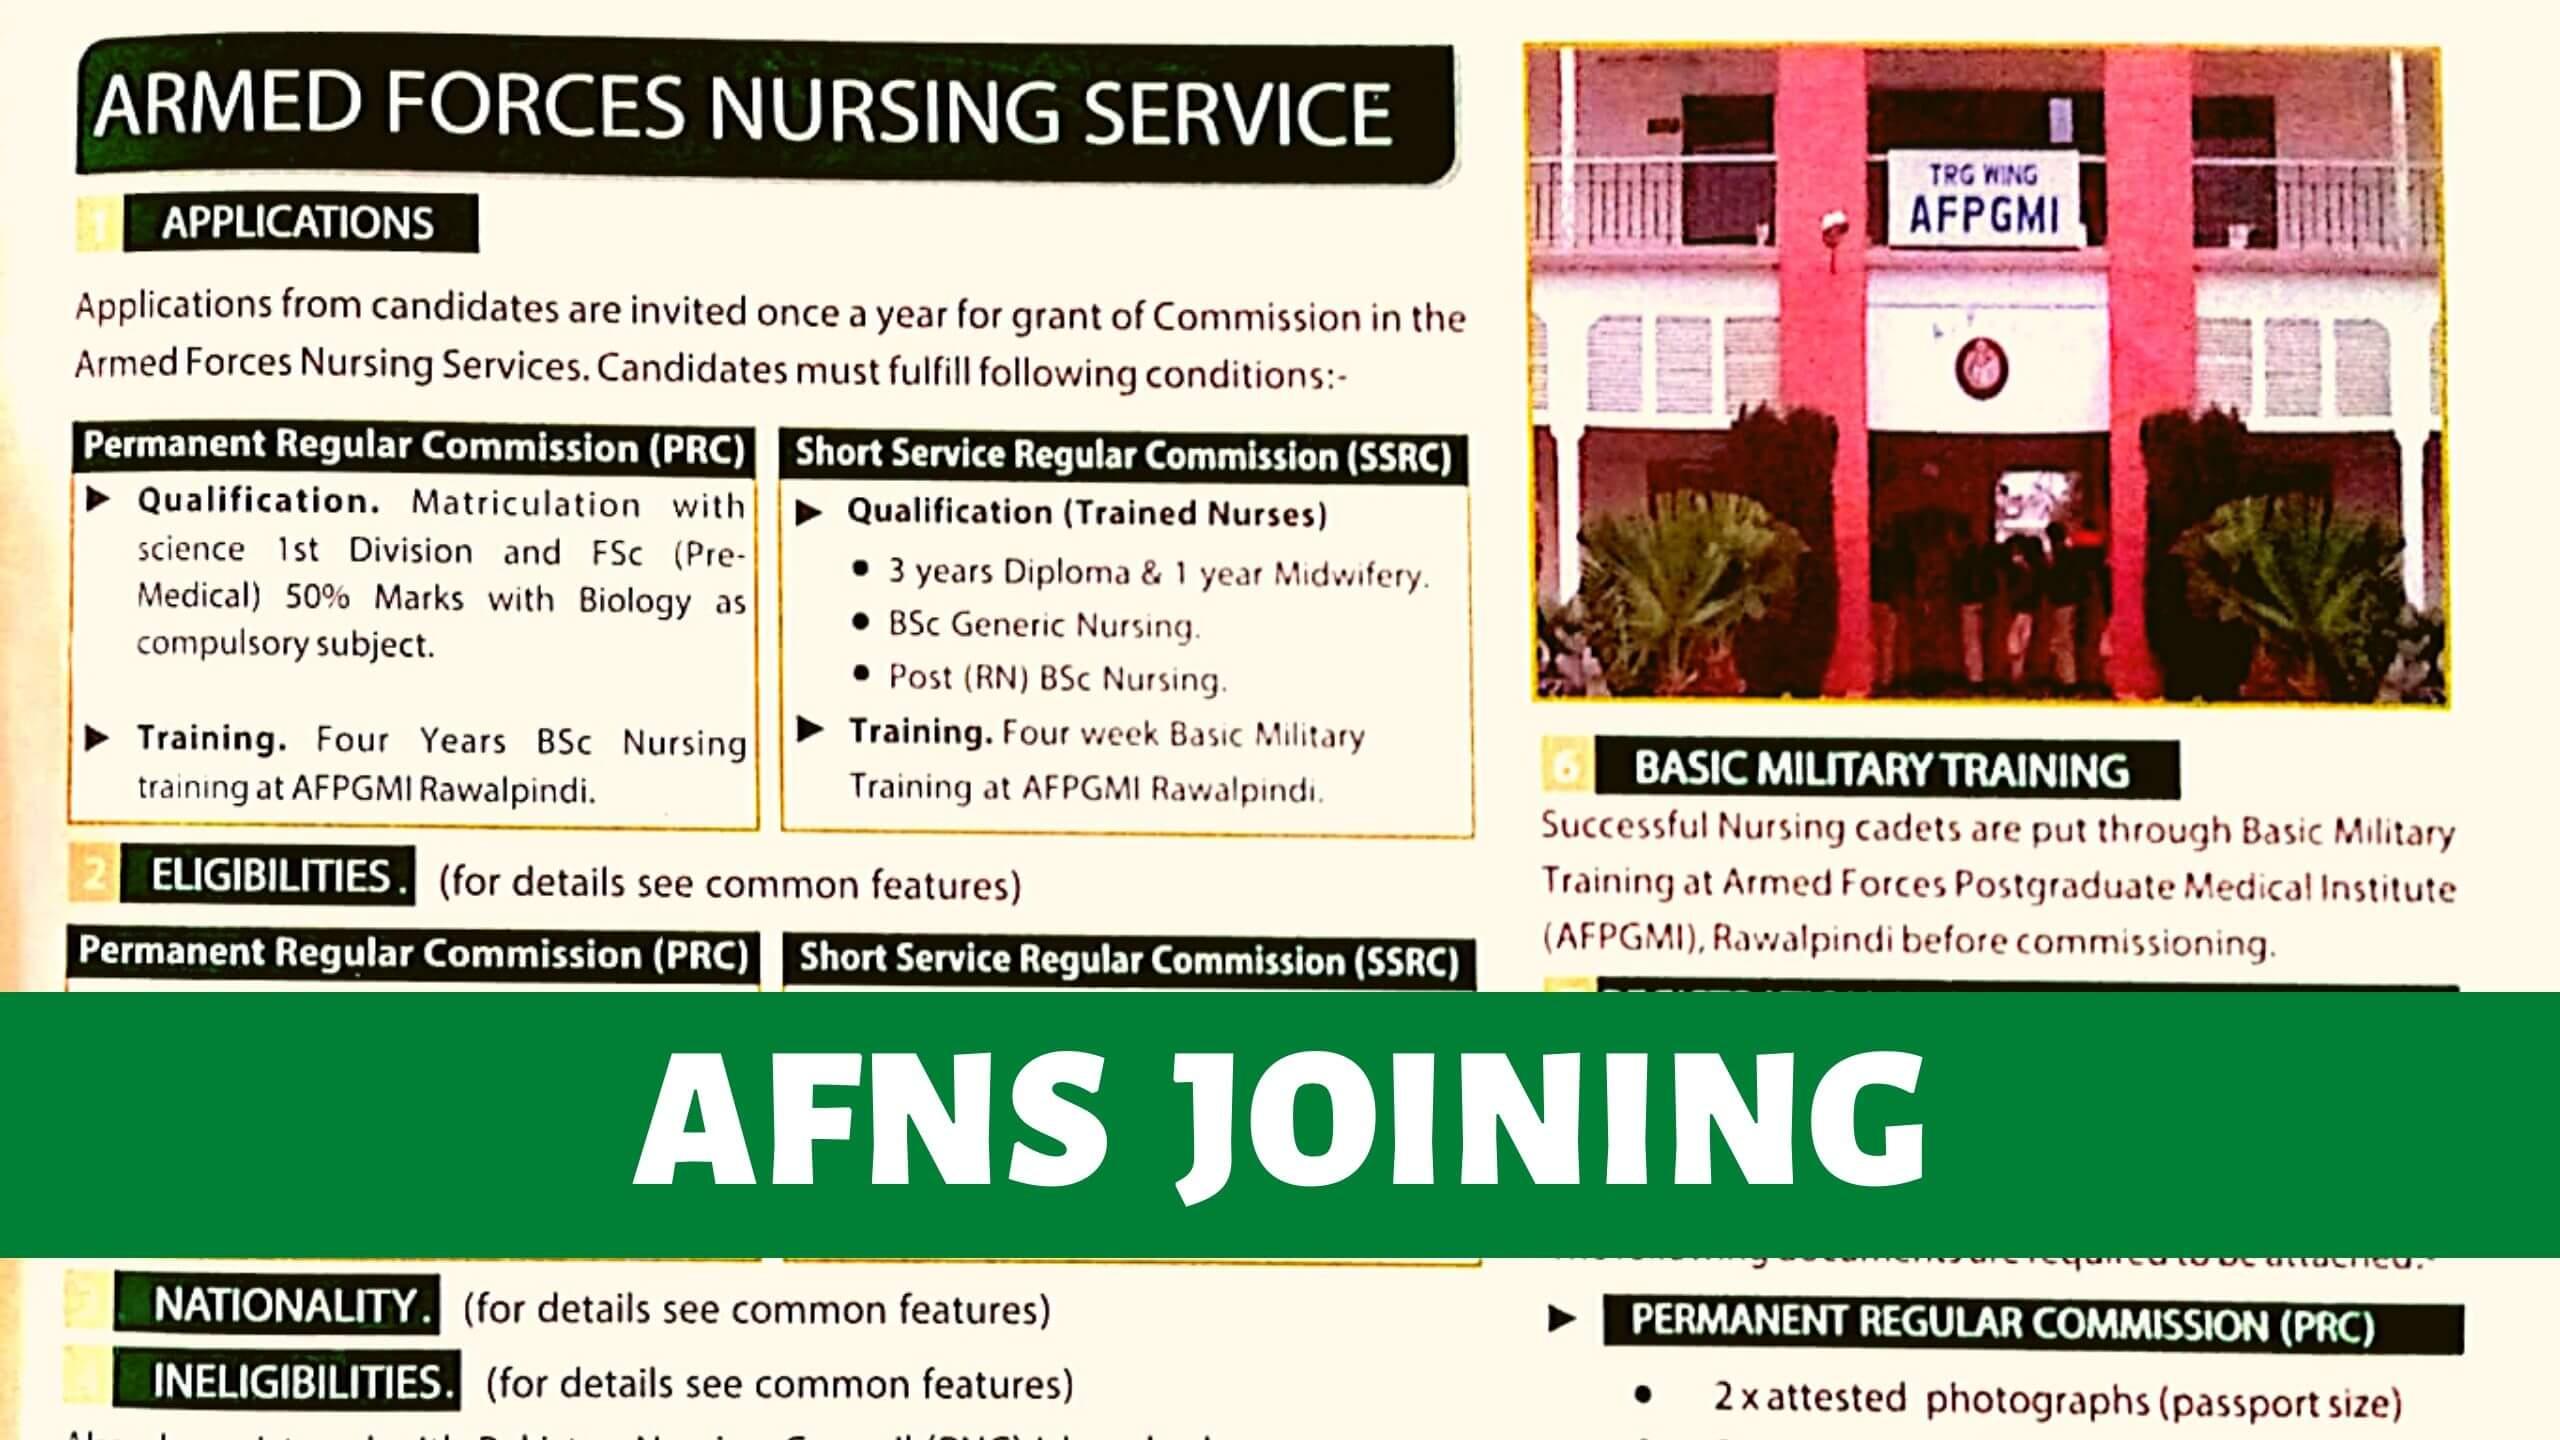 Armed Forces Nursing Services AFNS